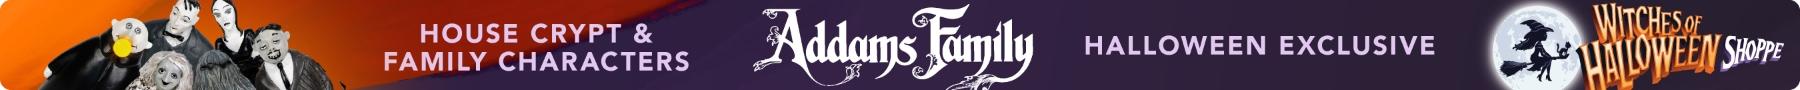 Halloween Addams Family Banner